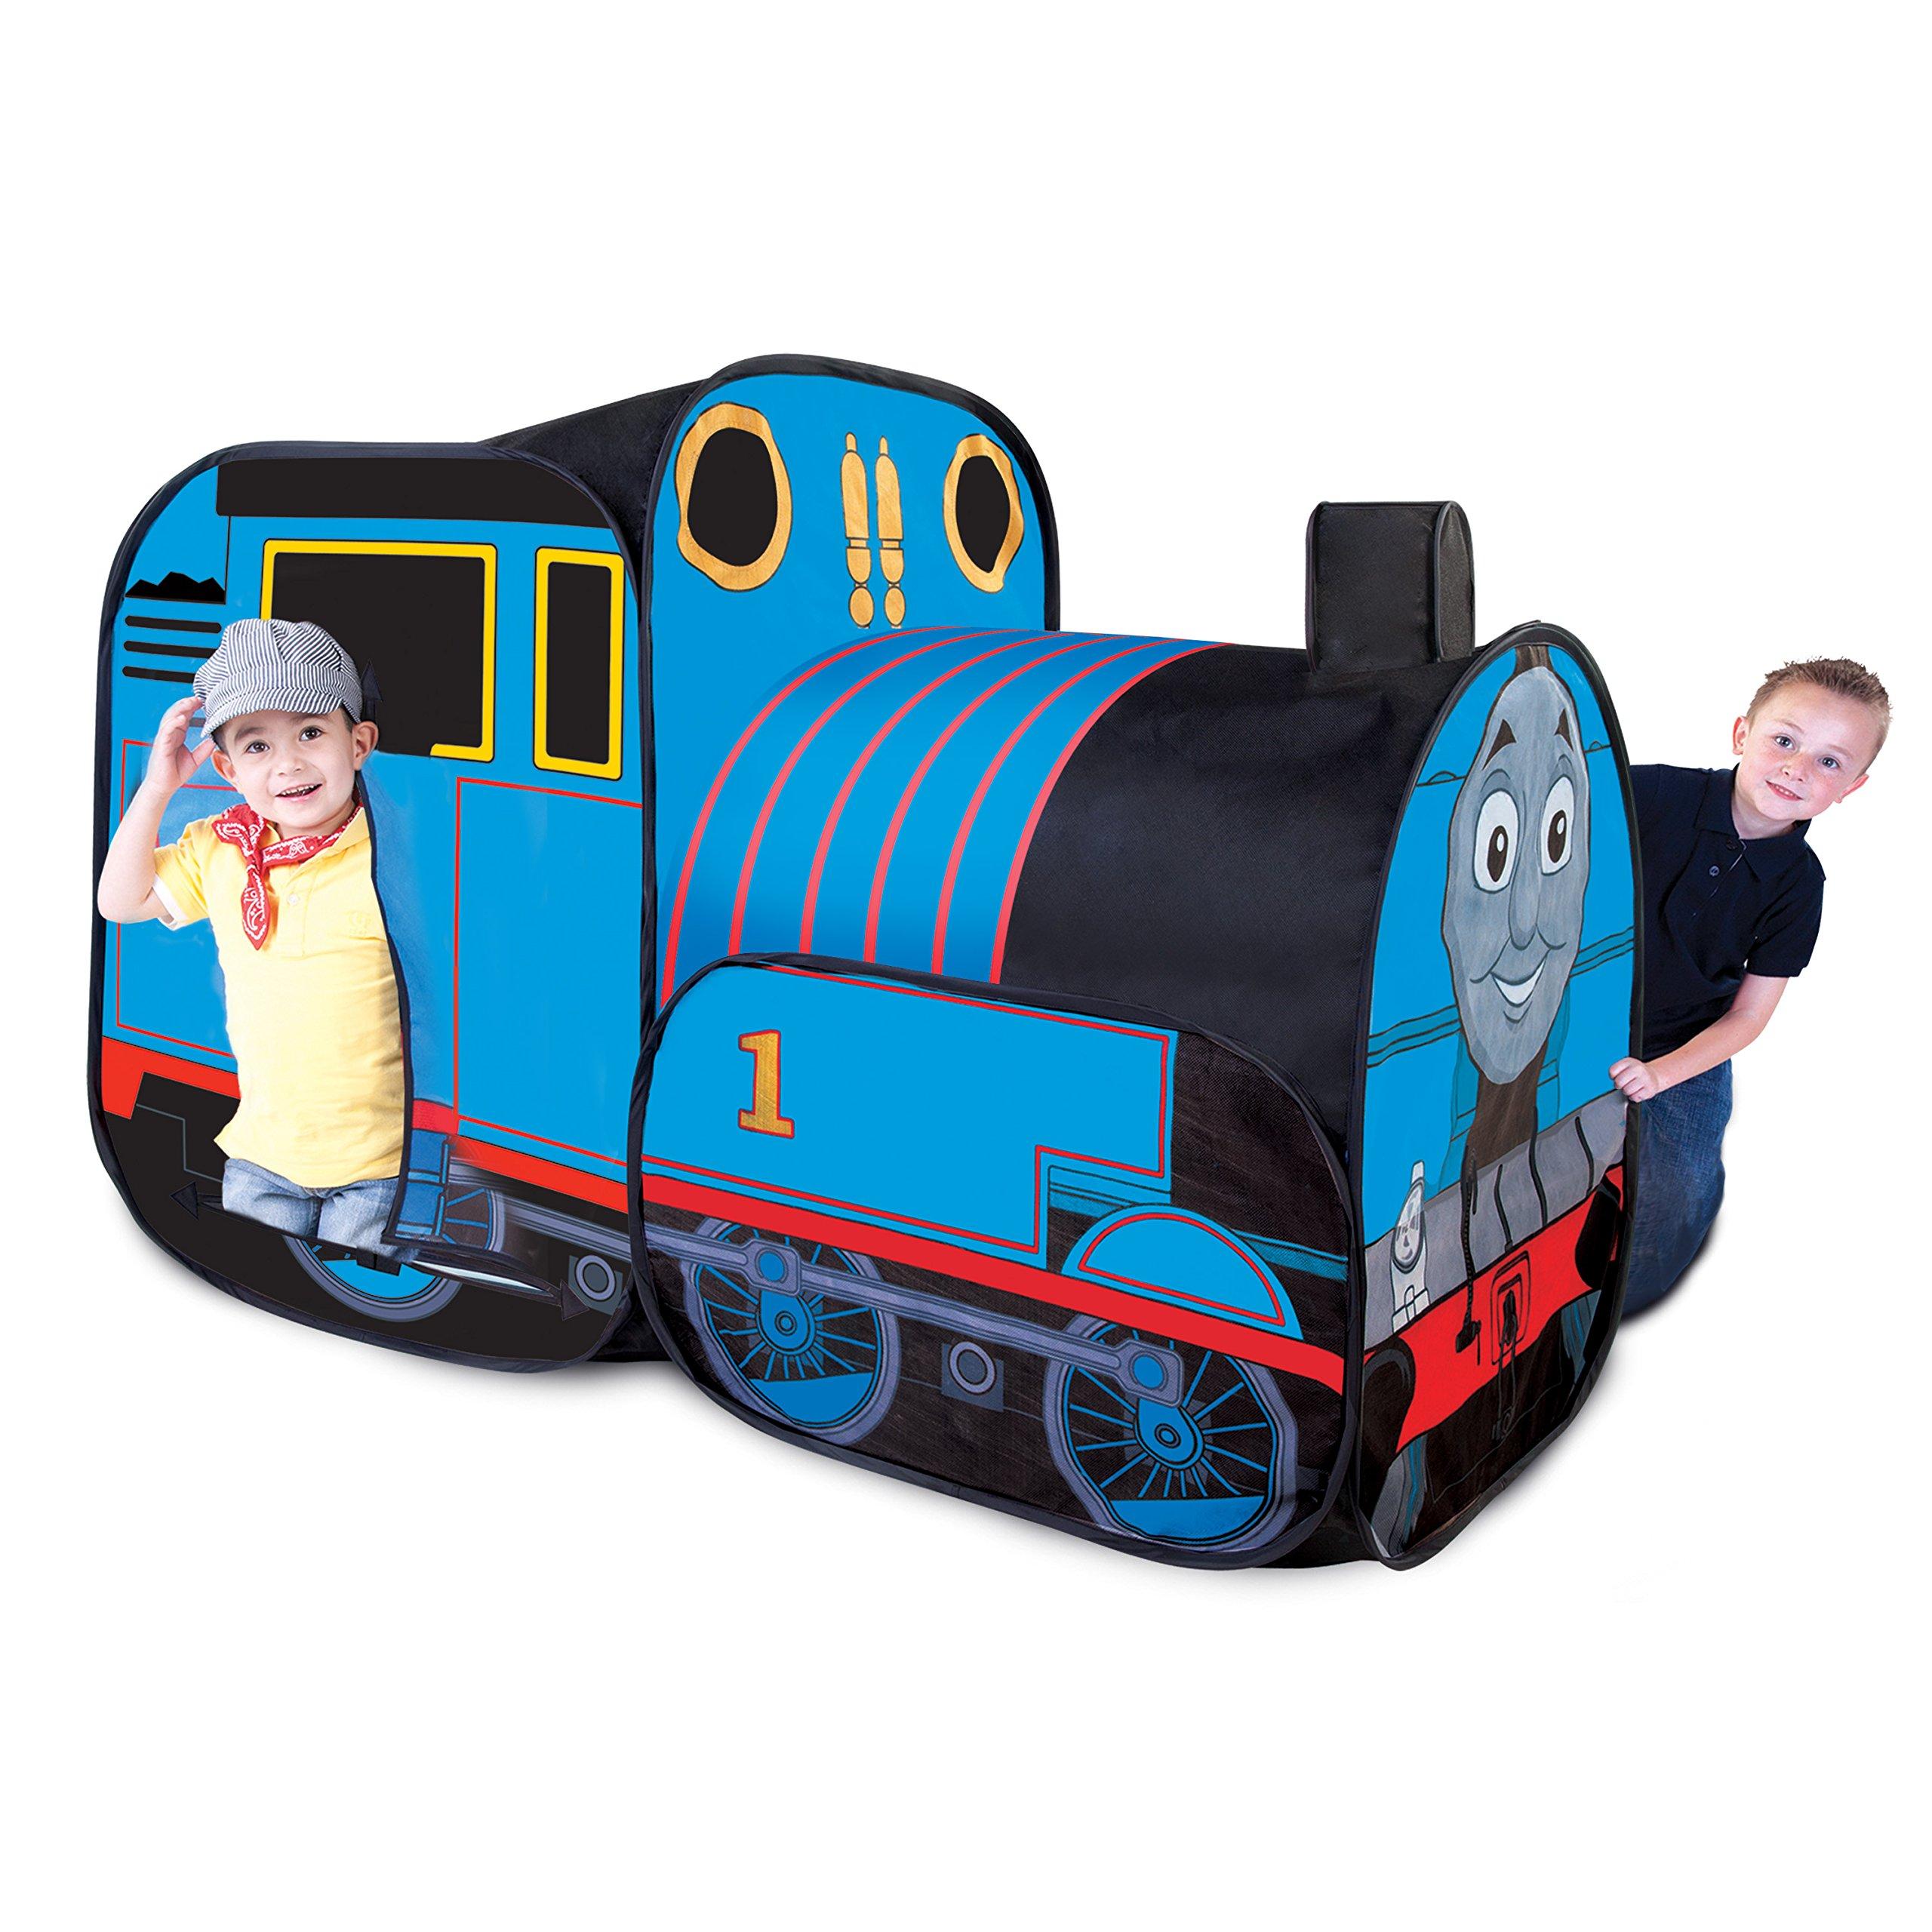 Playhut Thomas the Train Play Vehicle by Playhut